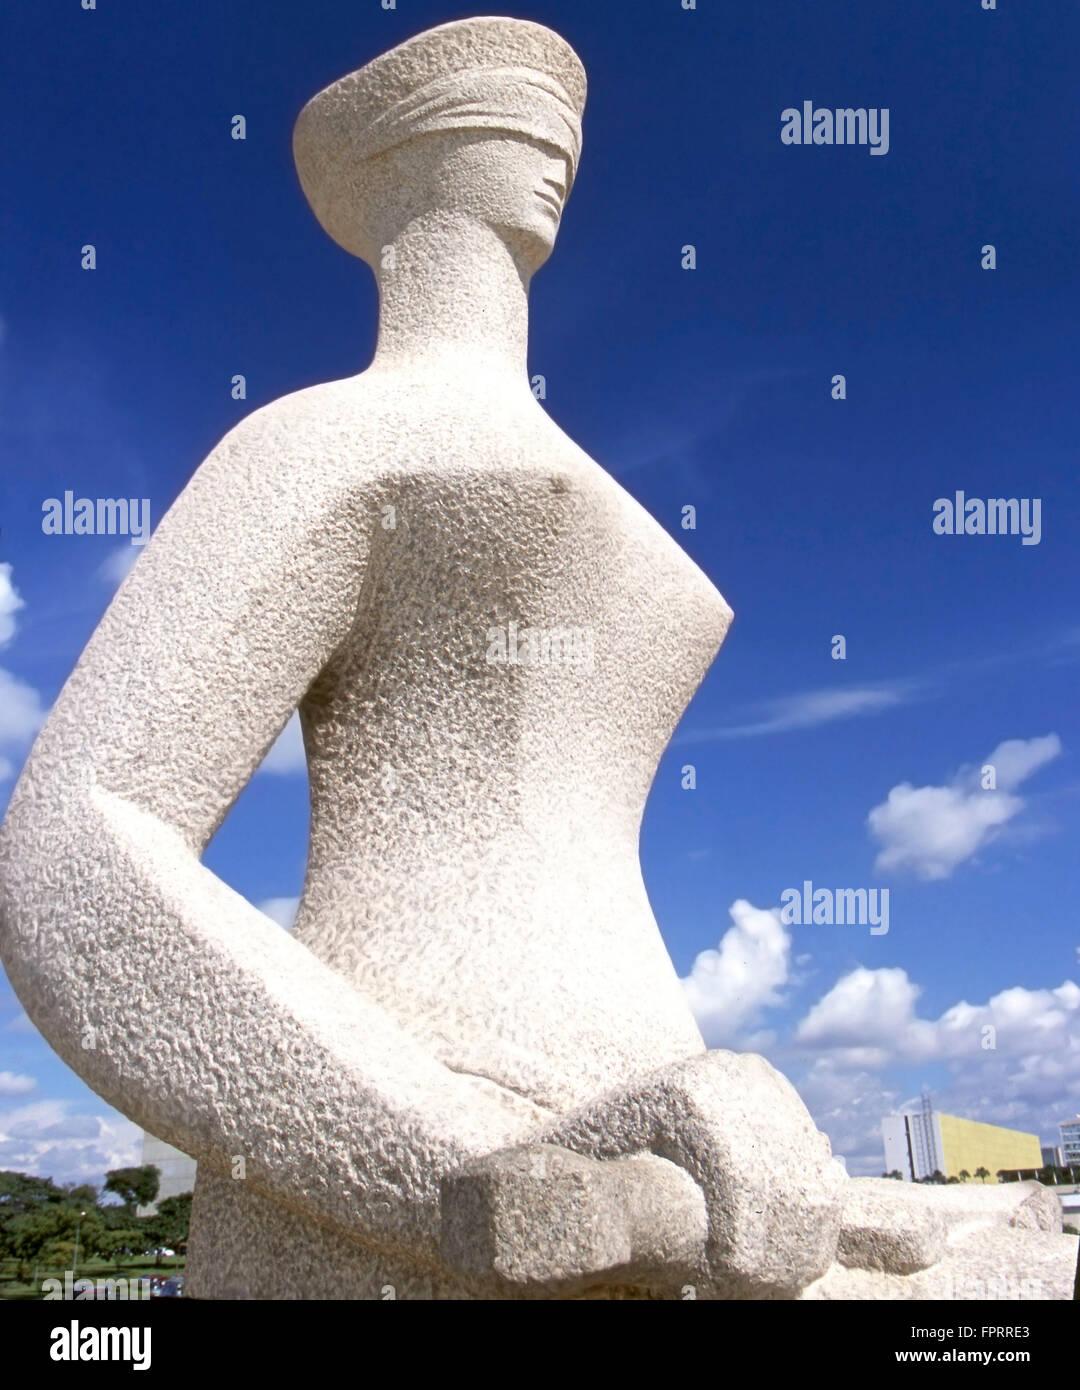 Alfredo Ceschiatti's statue of blind justice in Brasilia - Stock Image